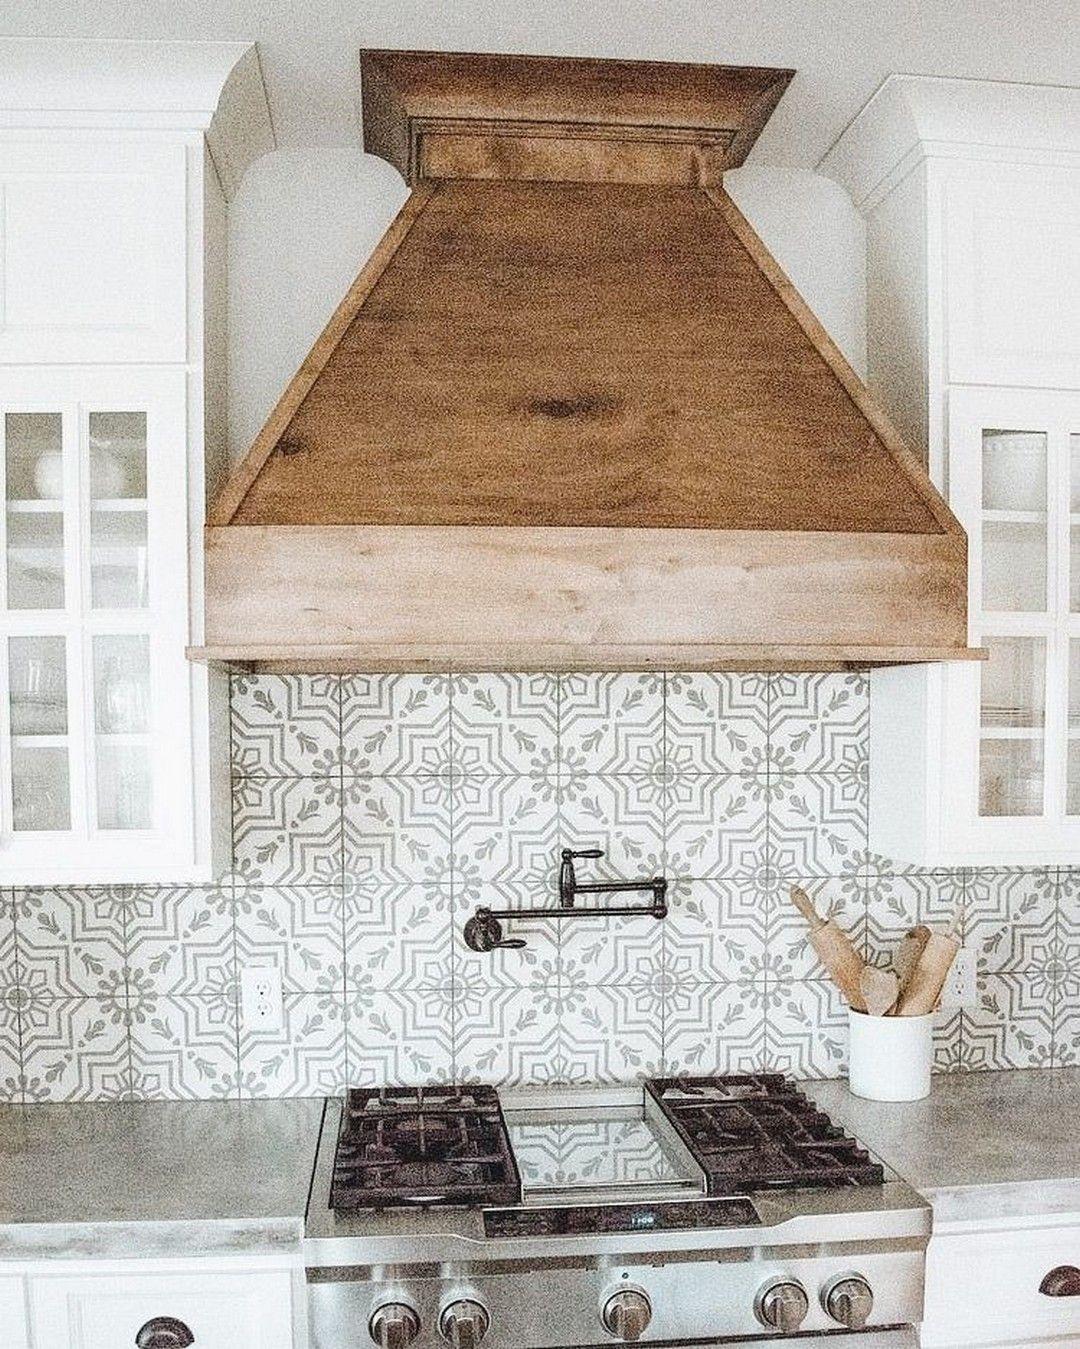 30 Amazing Design Ideas For A Kitchen Backsplash: 45 Upgrade Your Kitchen With These Amazing Backsplash